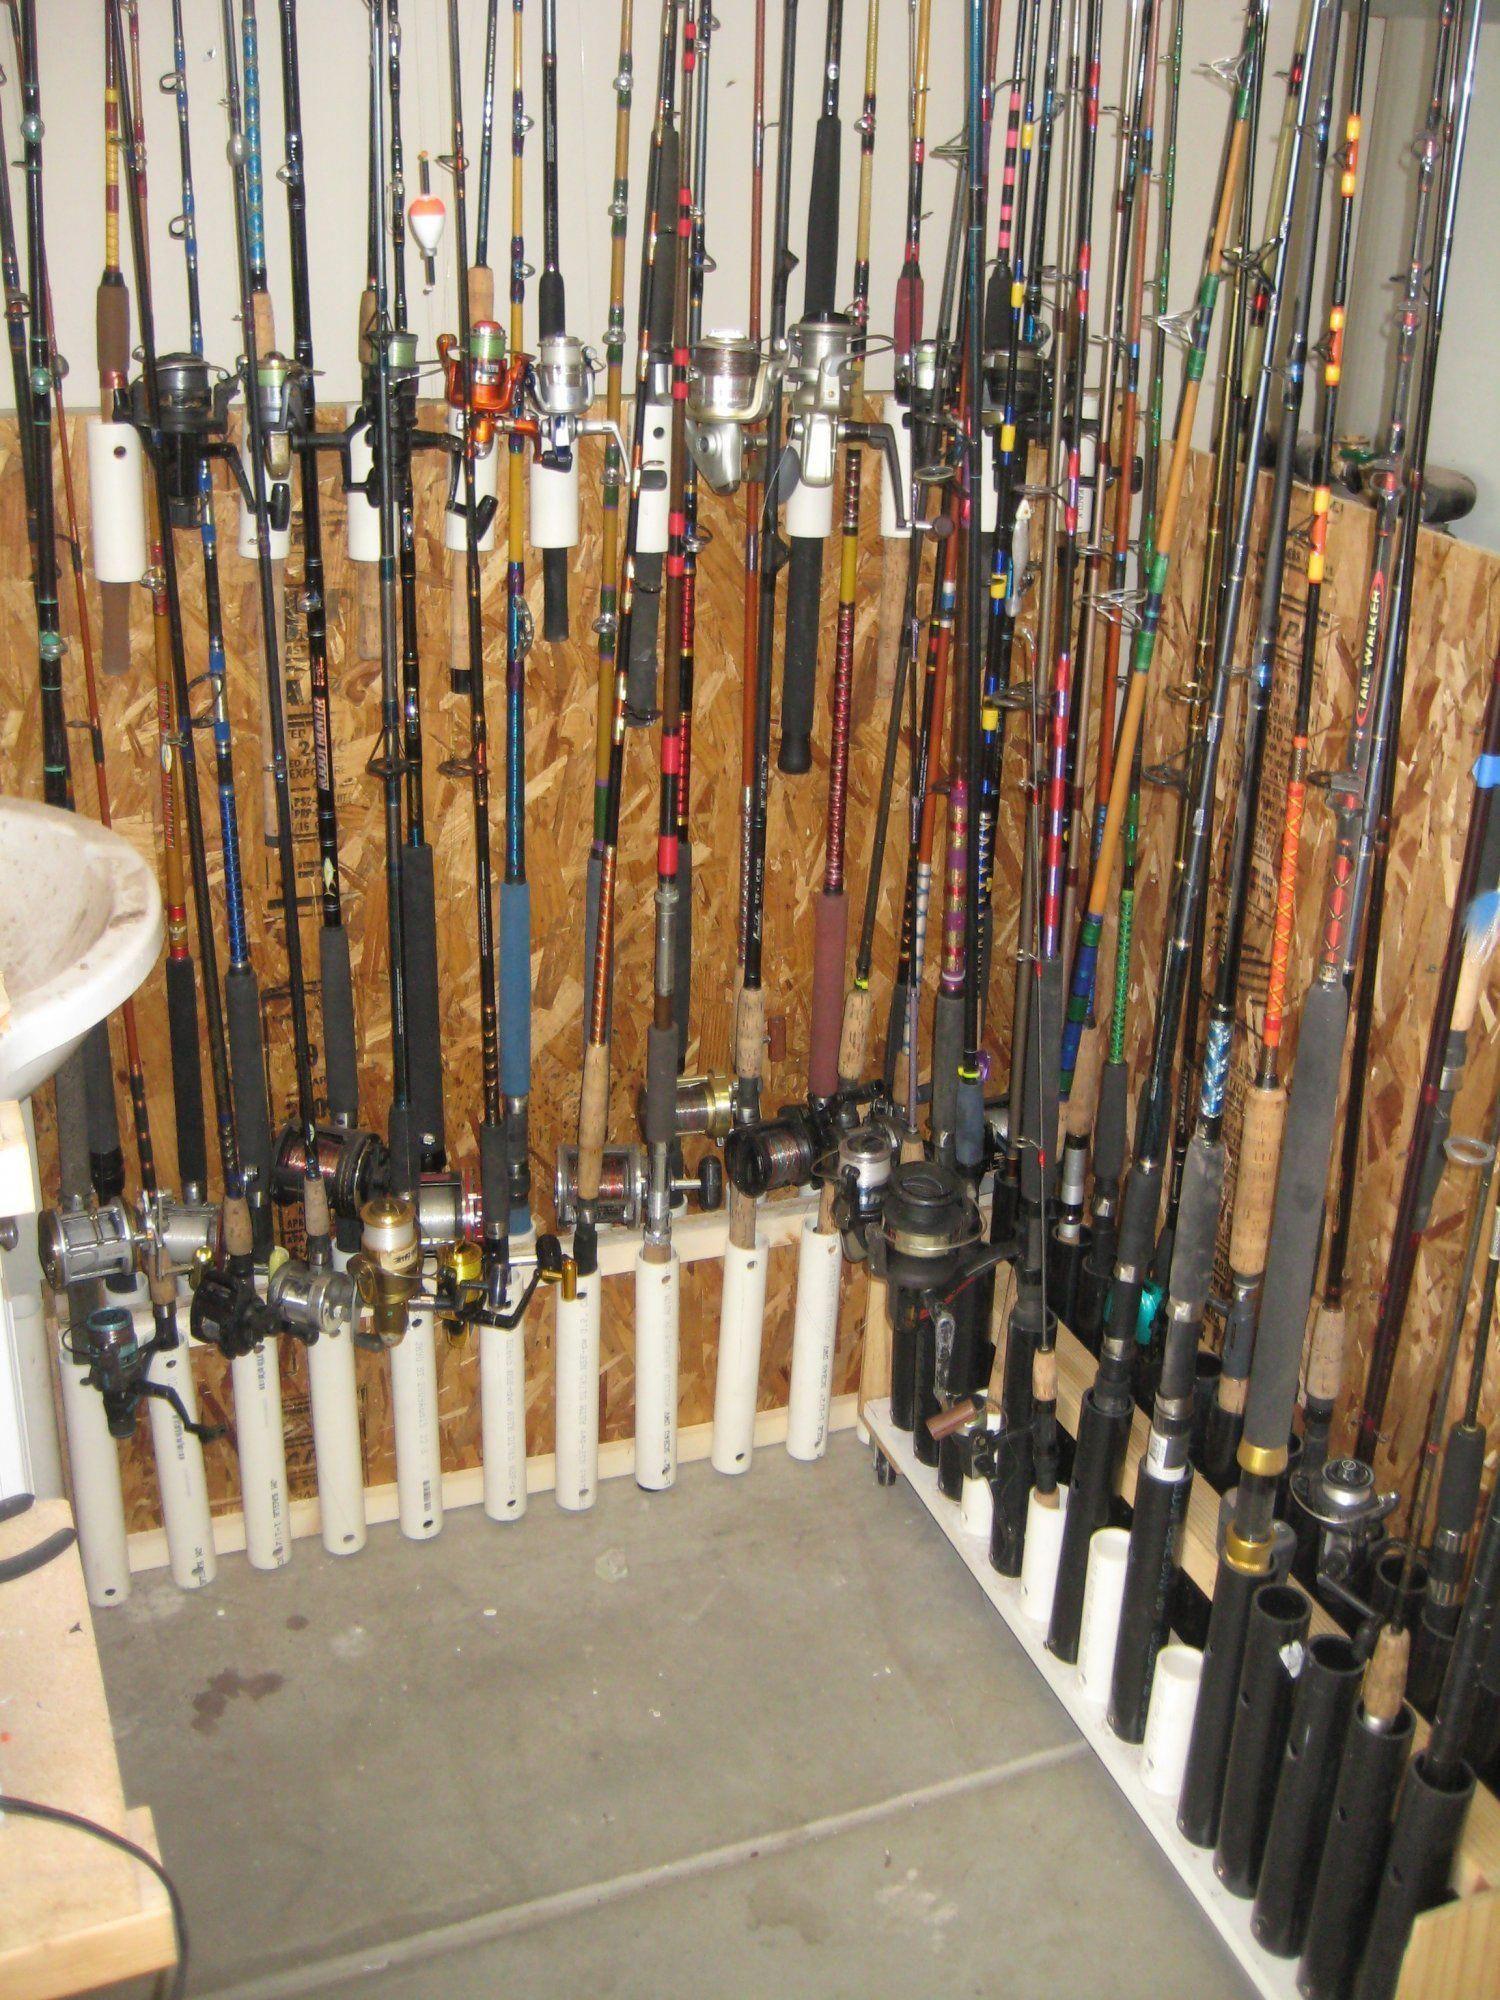 fishing garage gear rod storage rack pole tackle holder pvc organized hacks boat holders plans california organization truck saltwater idea